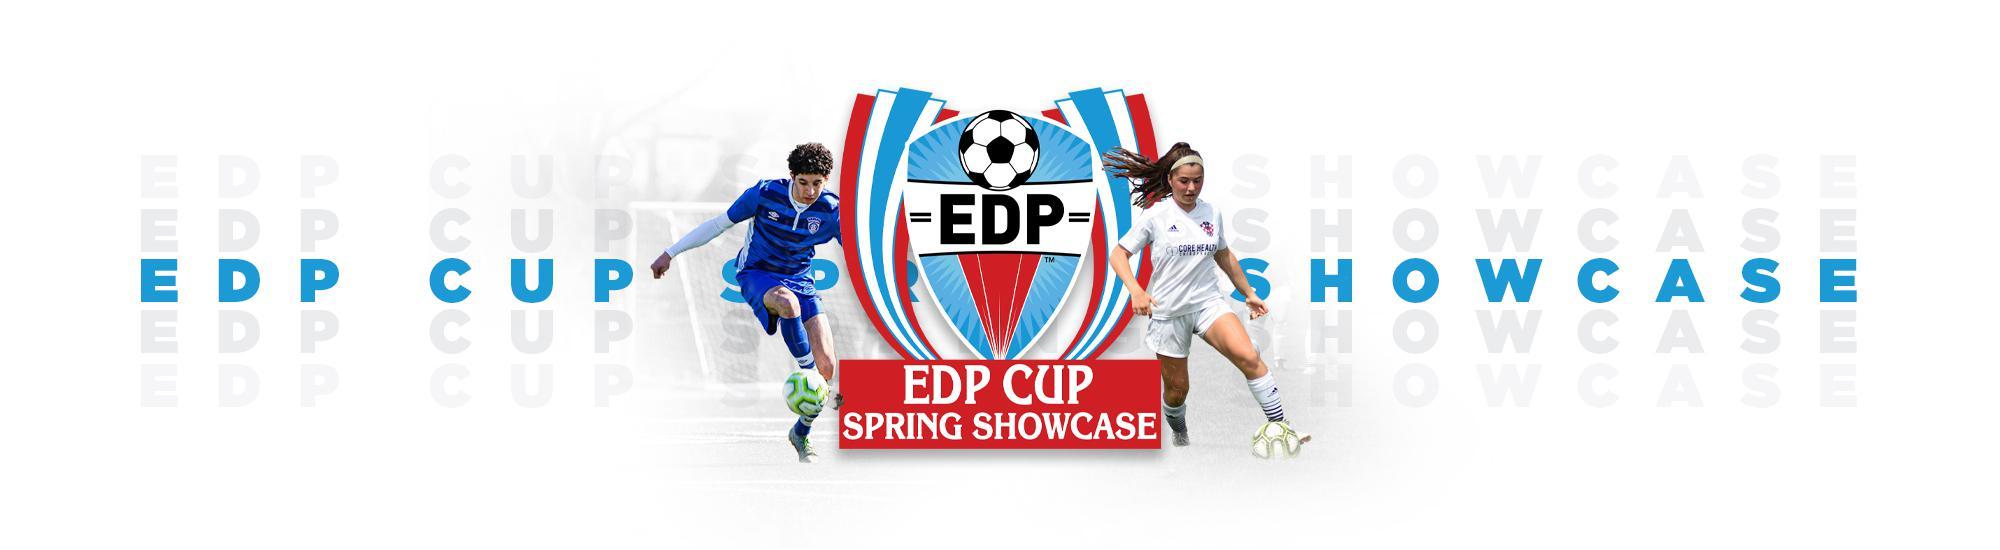 EDP Cup Spring Showcase